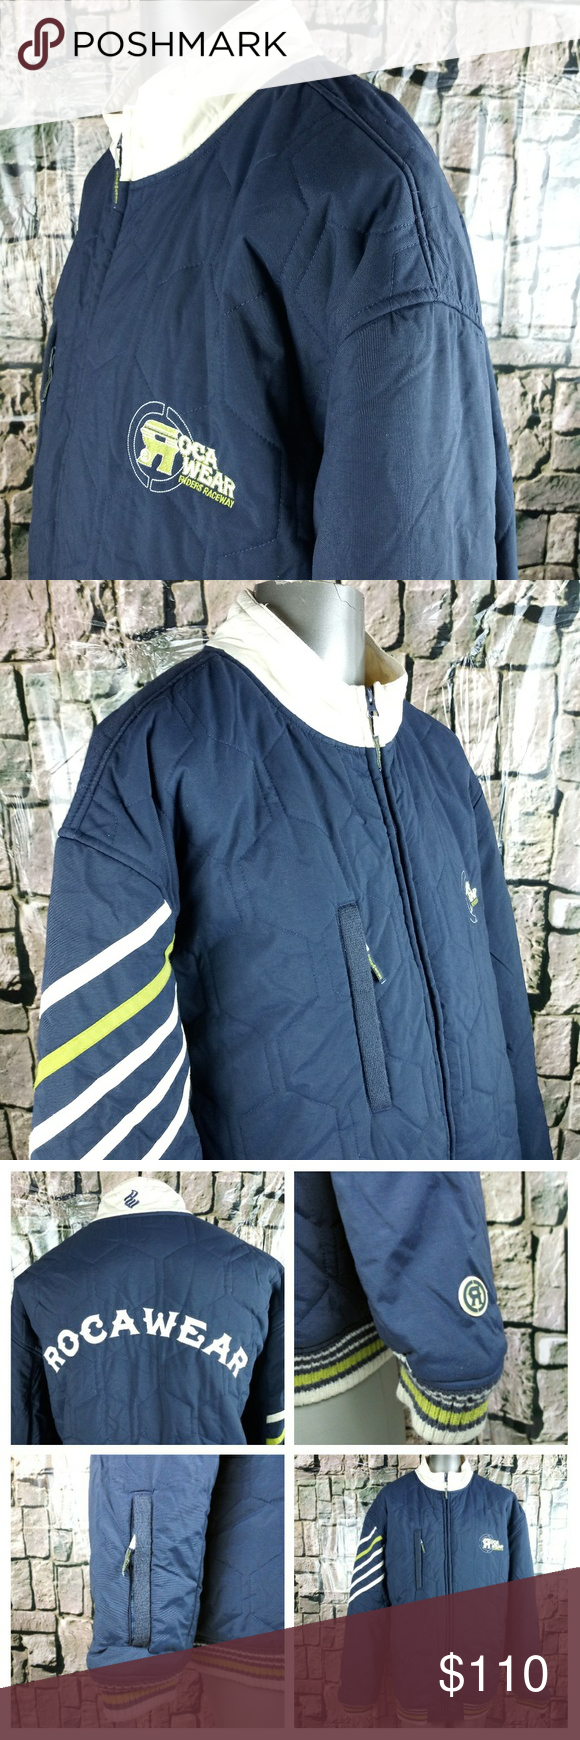 Rare Find Roca Wear Puffer Coat Riders Raceway Puffer Coat How To Wear Clothes Design [ 1740 x 580 Pixel ]